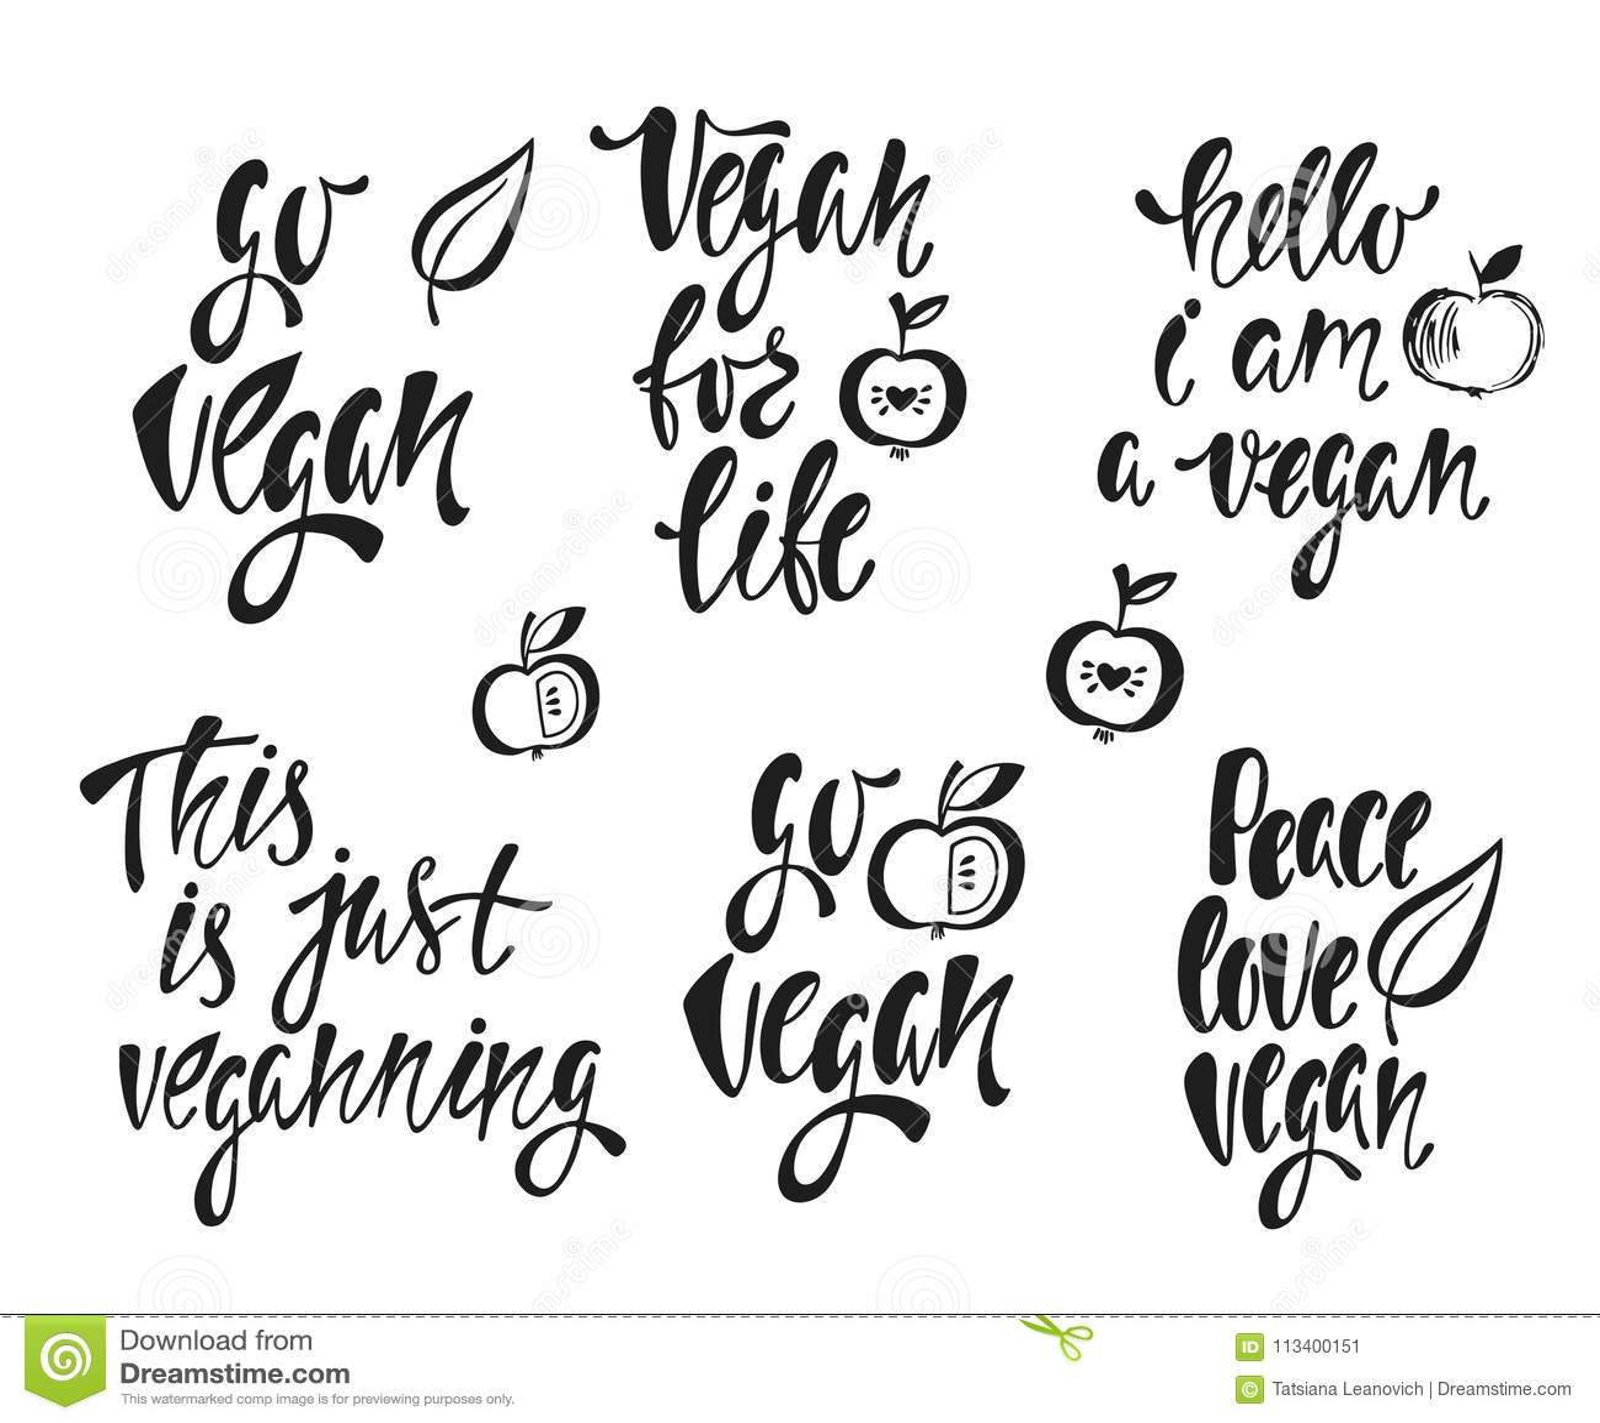 Vegan Vector Set Of Hand Drawn Lettering Phrases Food Design